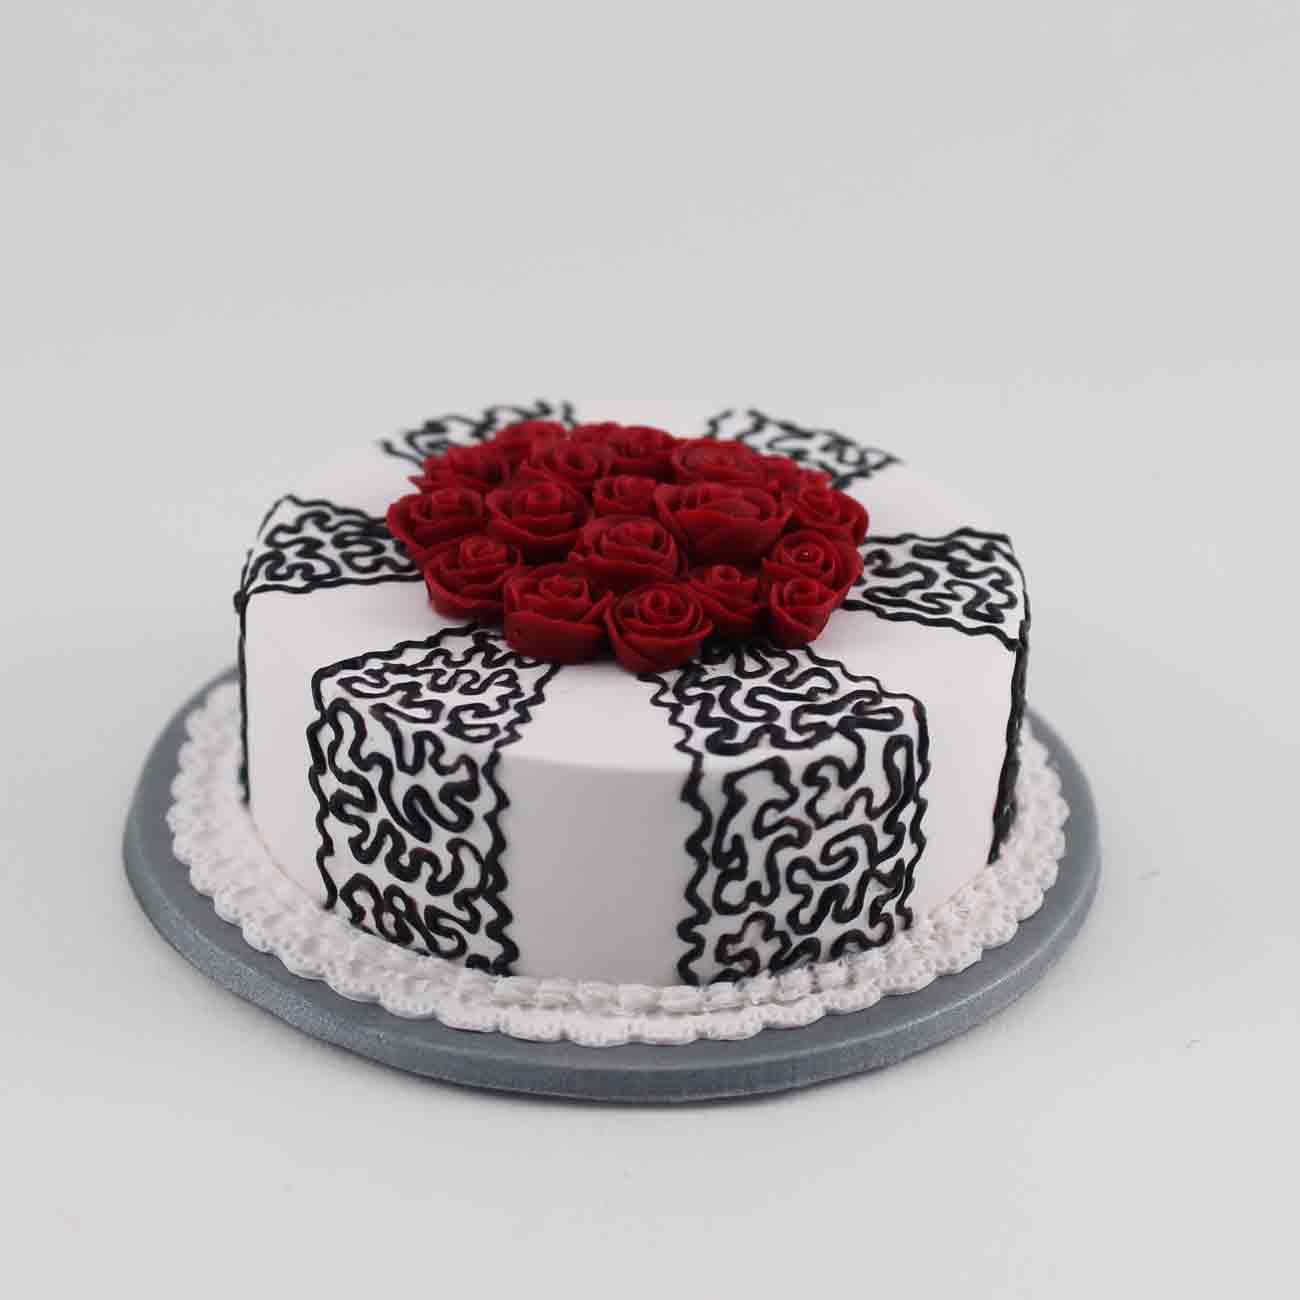 single tier wedding cake with burgandy roses.jpg